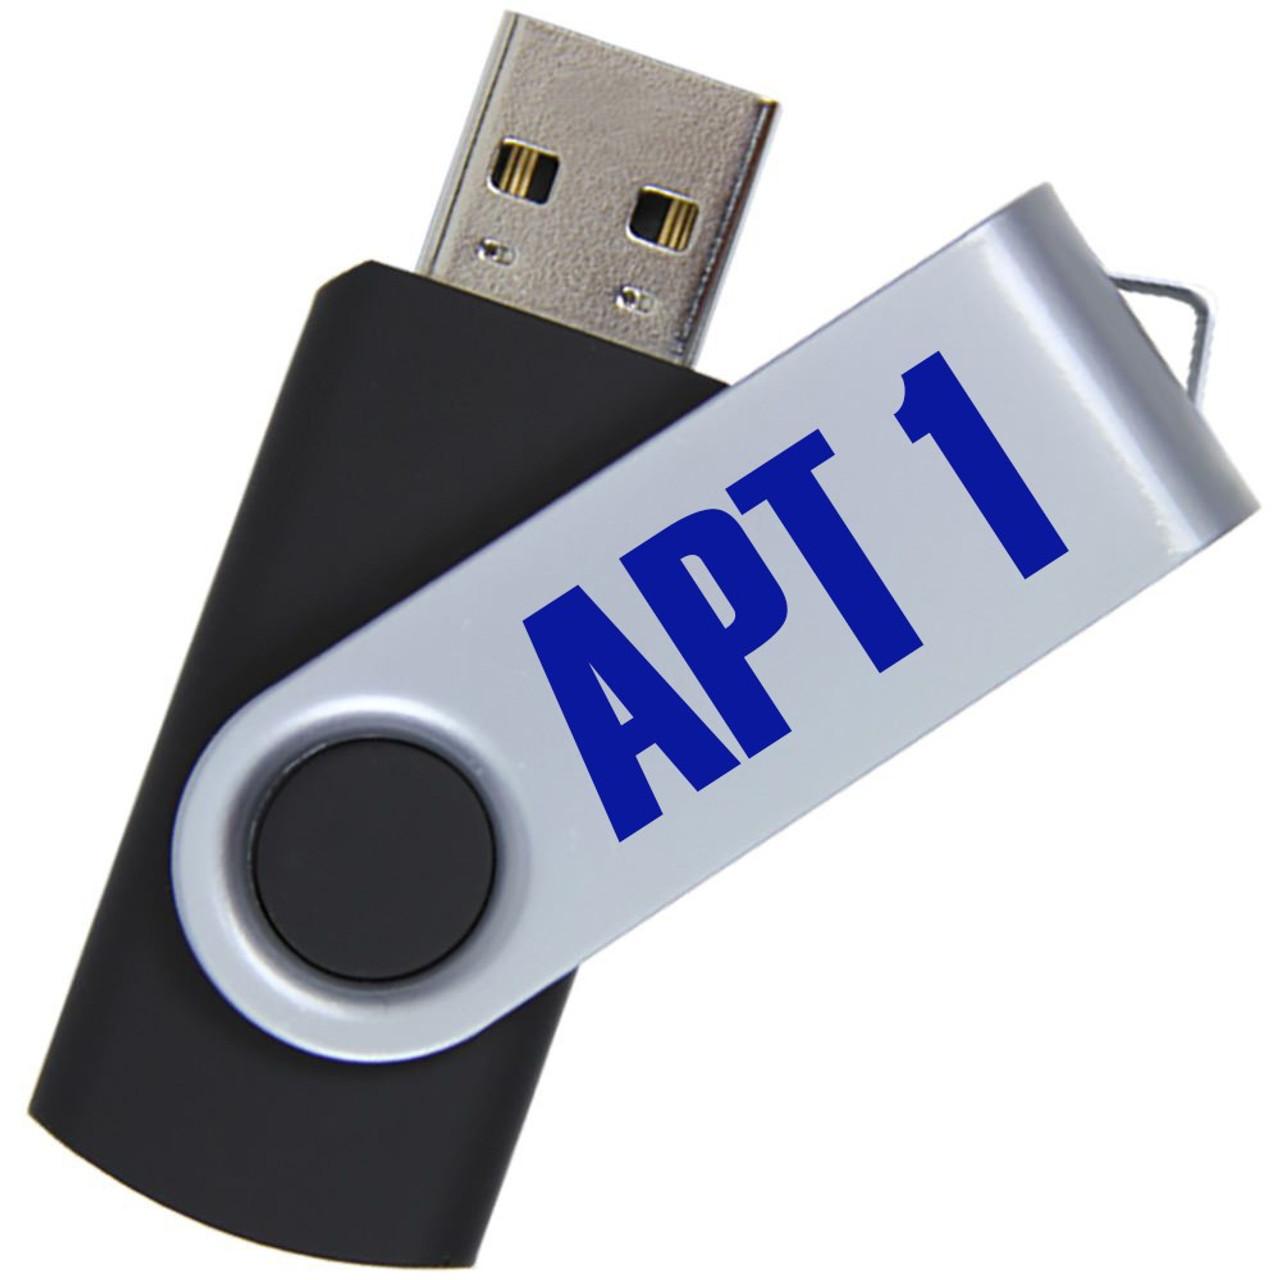 APT1 Extra USB Drive w/Audio Files